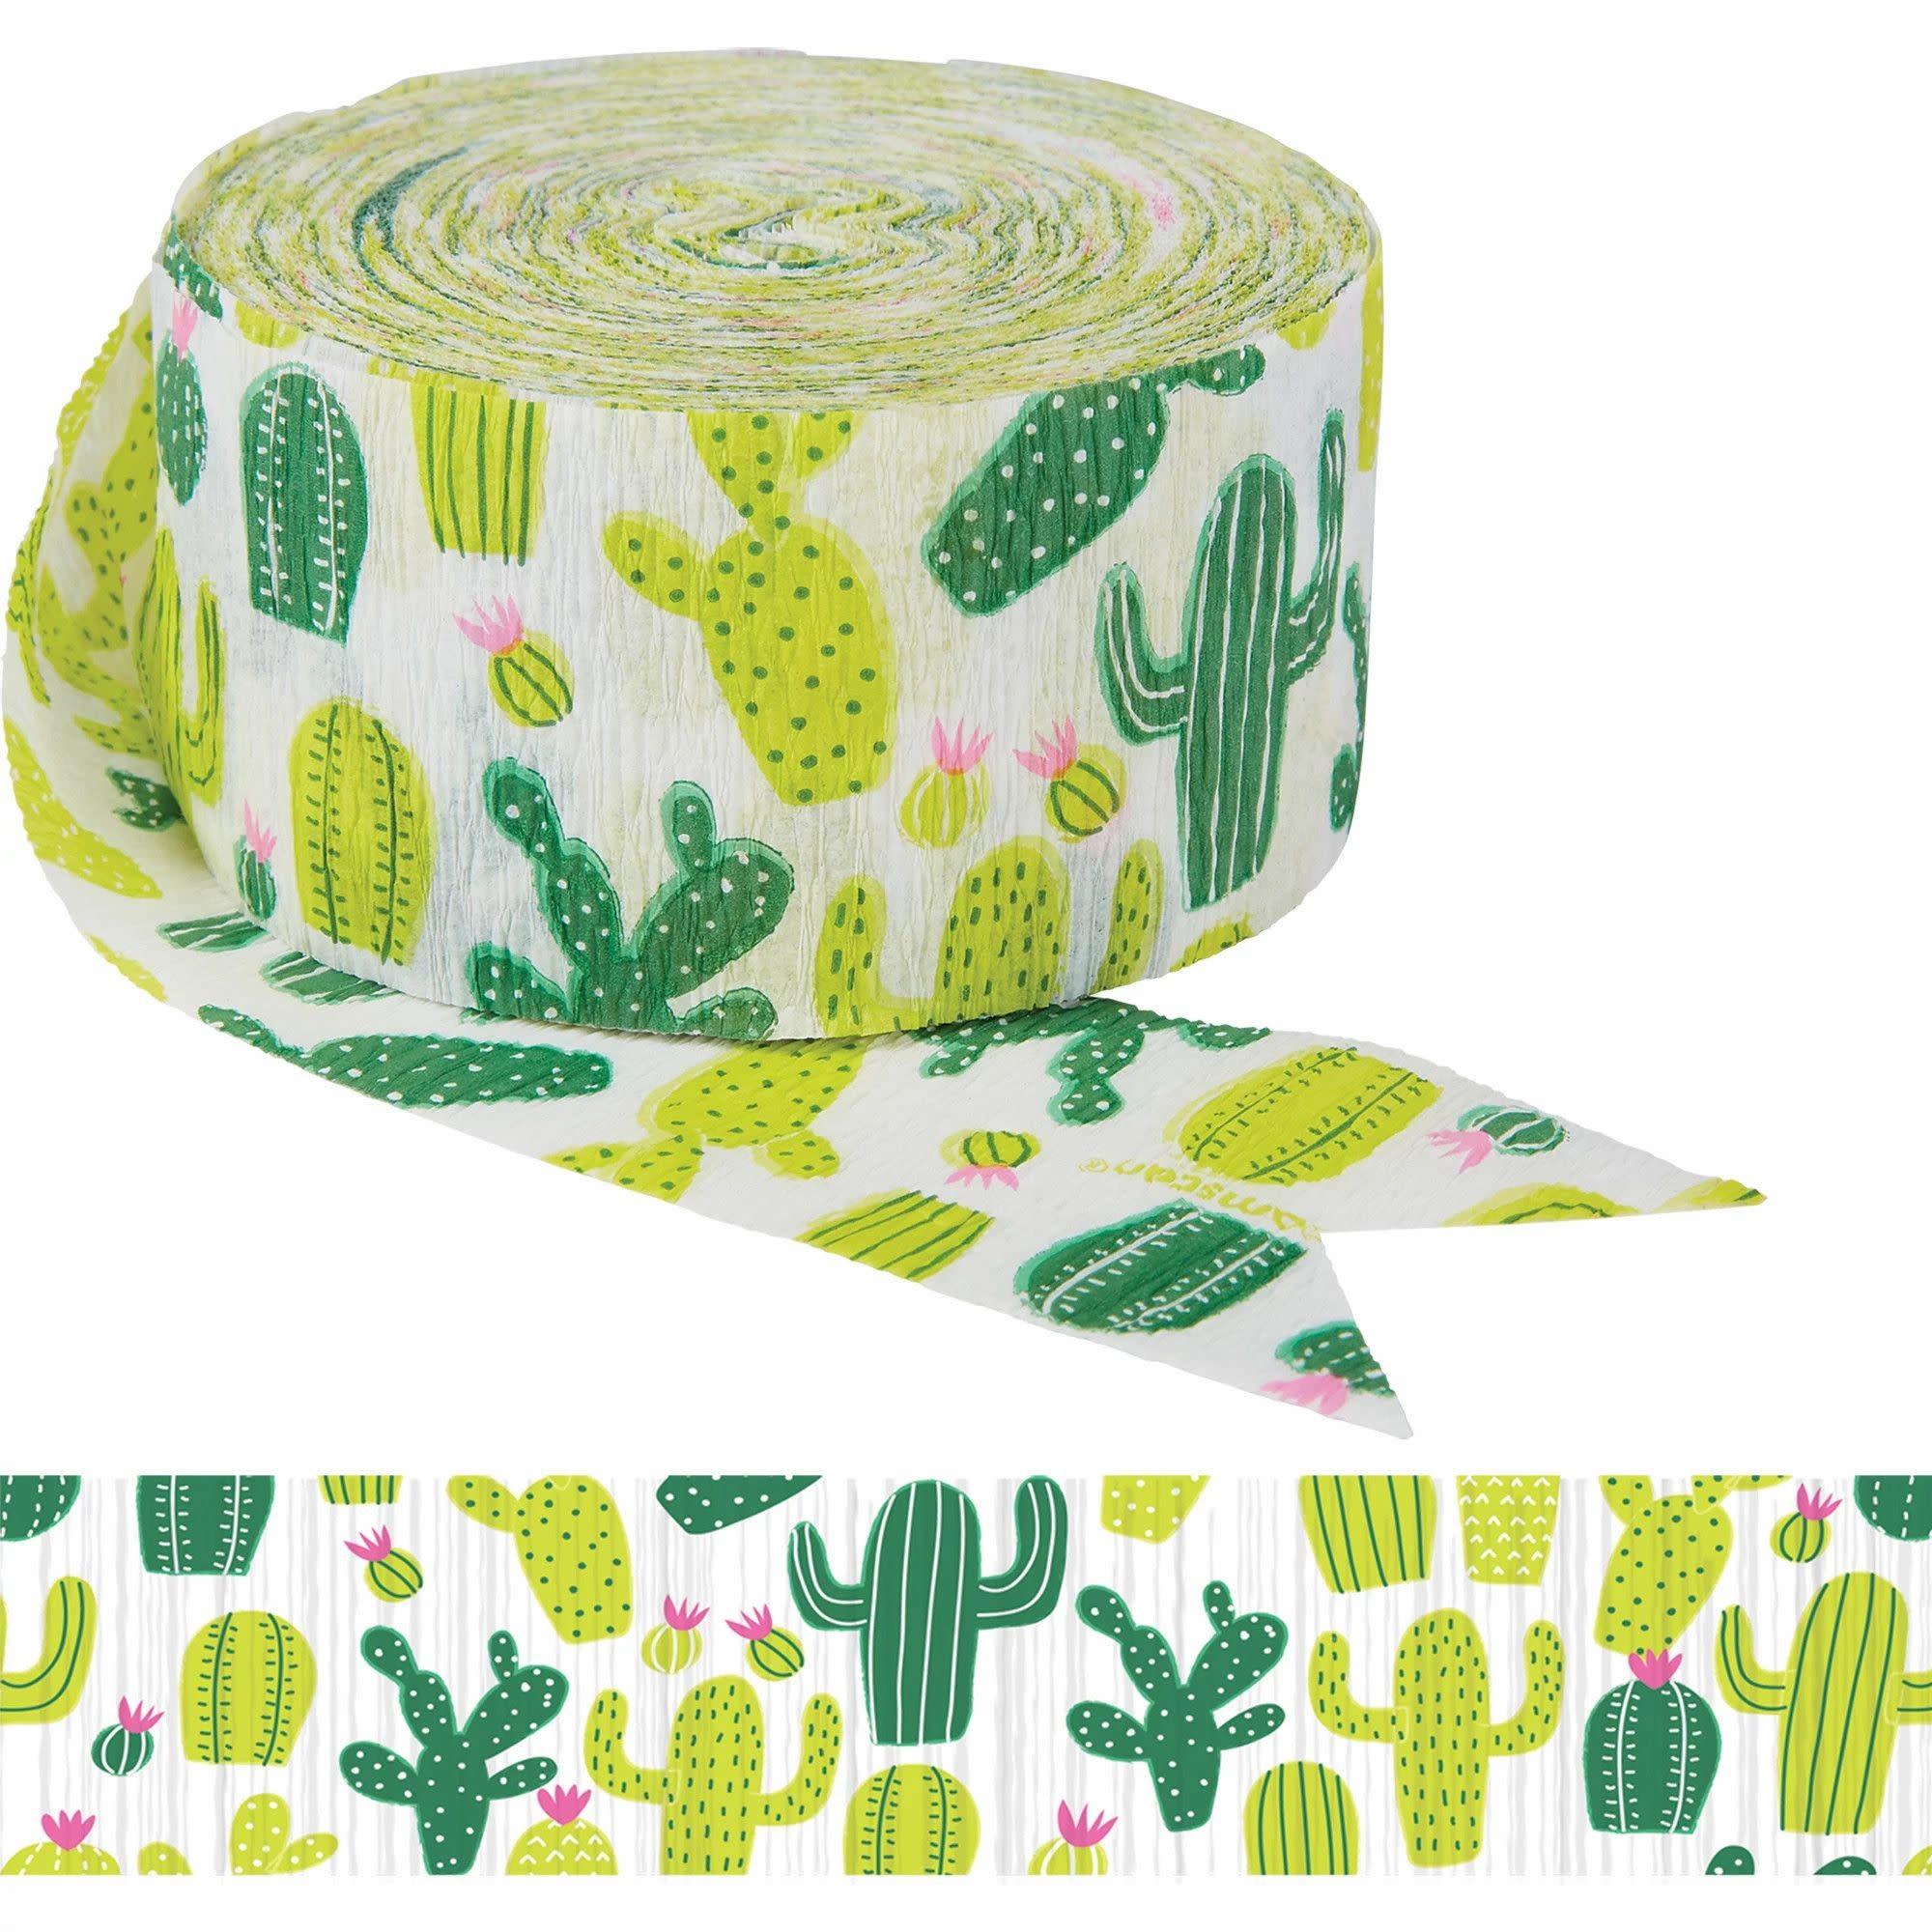 Printed Crepe Streamer, 81' - Cactus